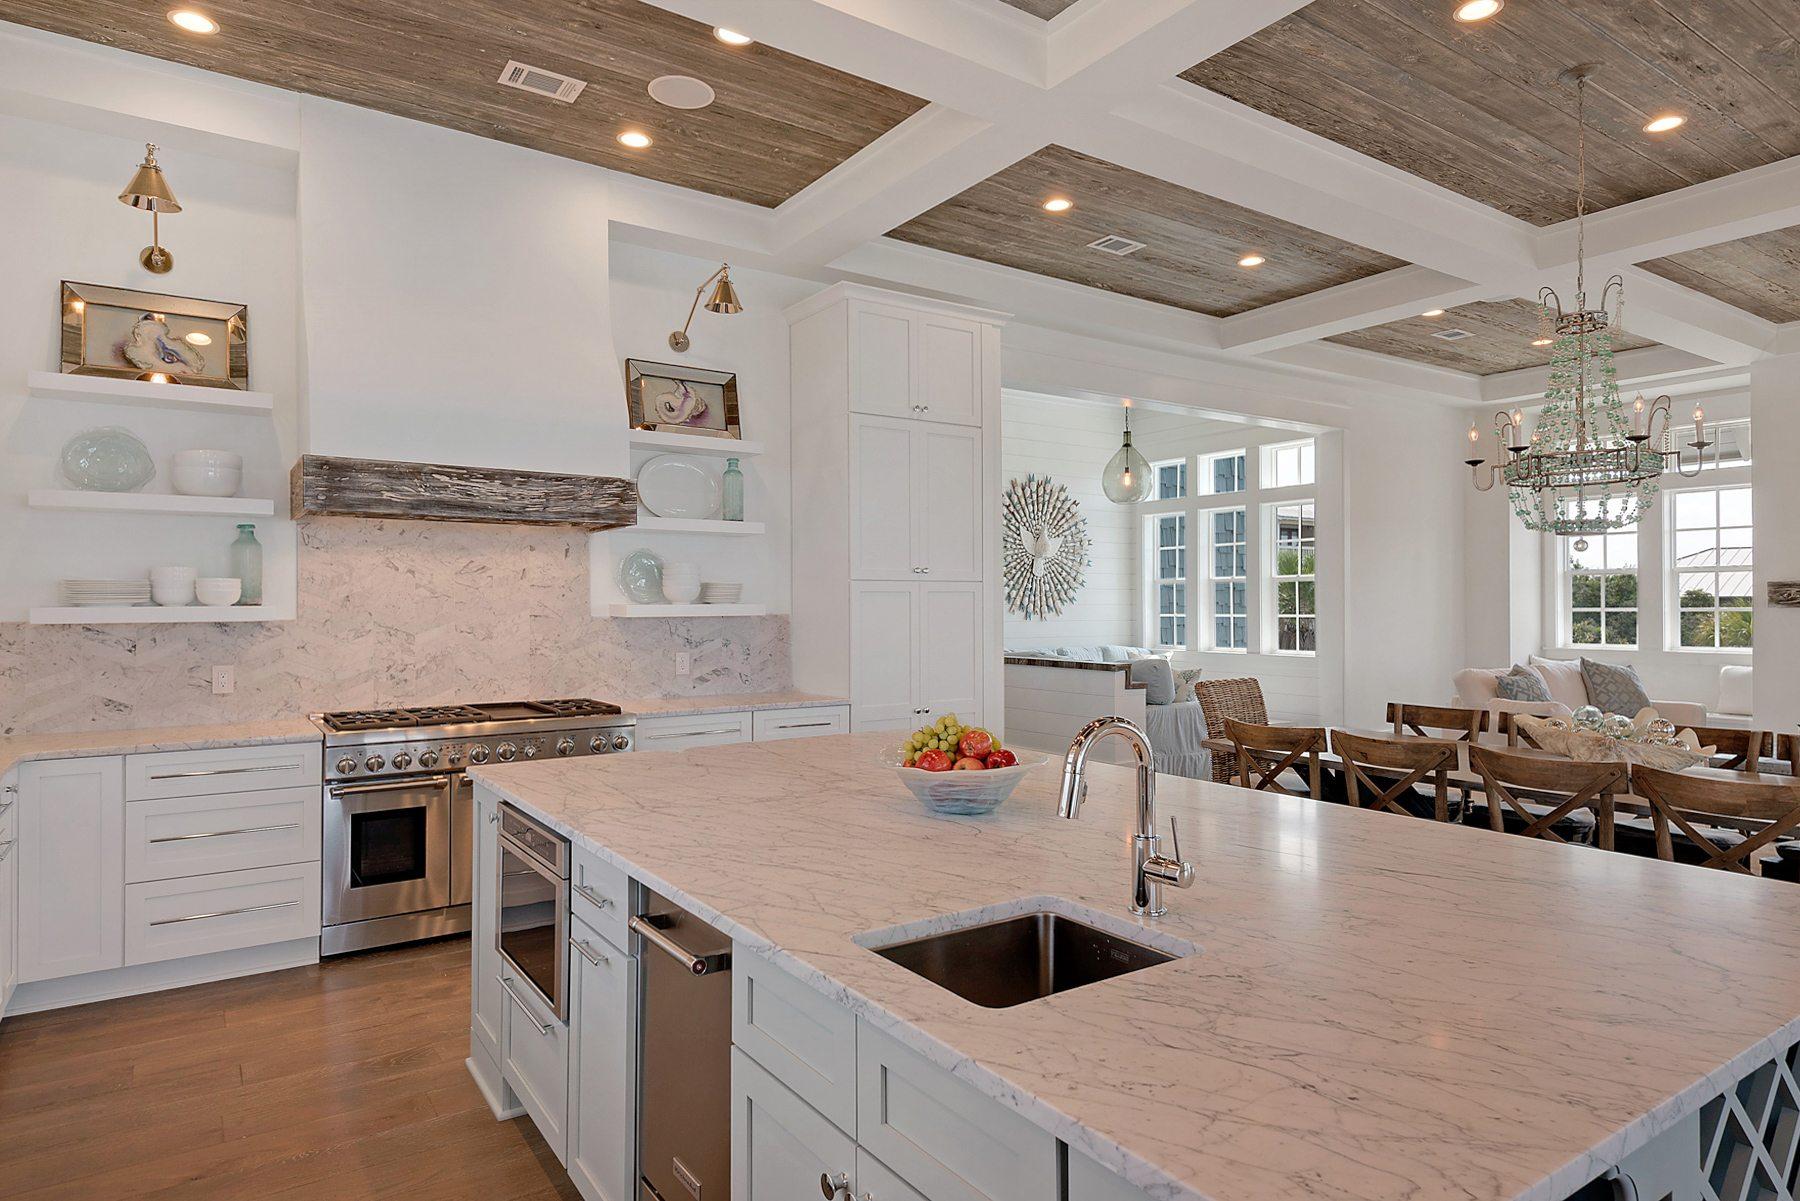 kitchens etc kitchen design on 30a 6 Kitchens Etc 30A